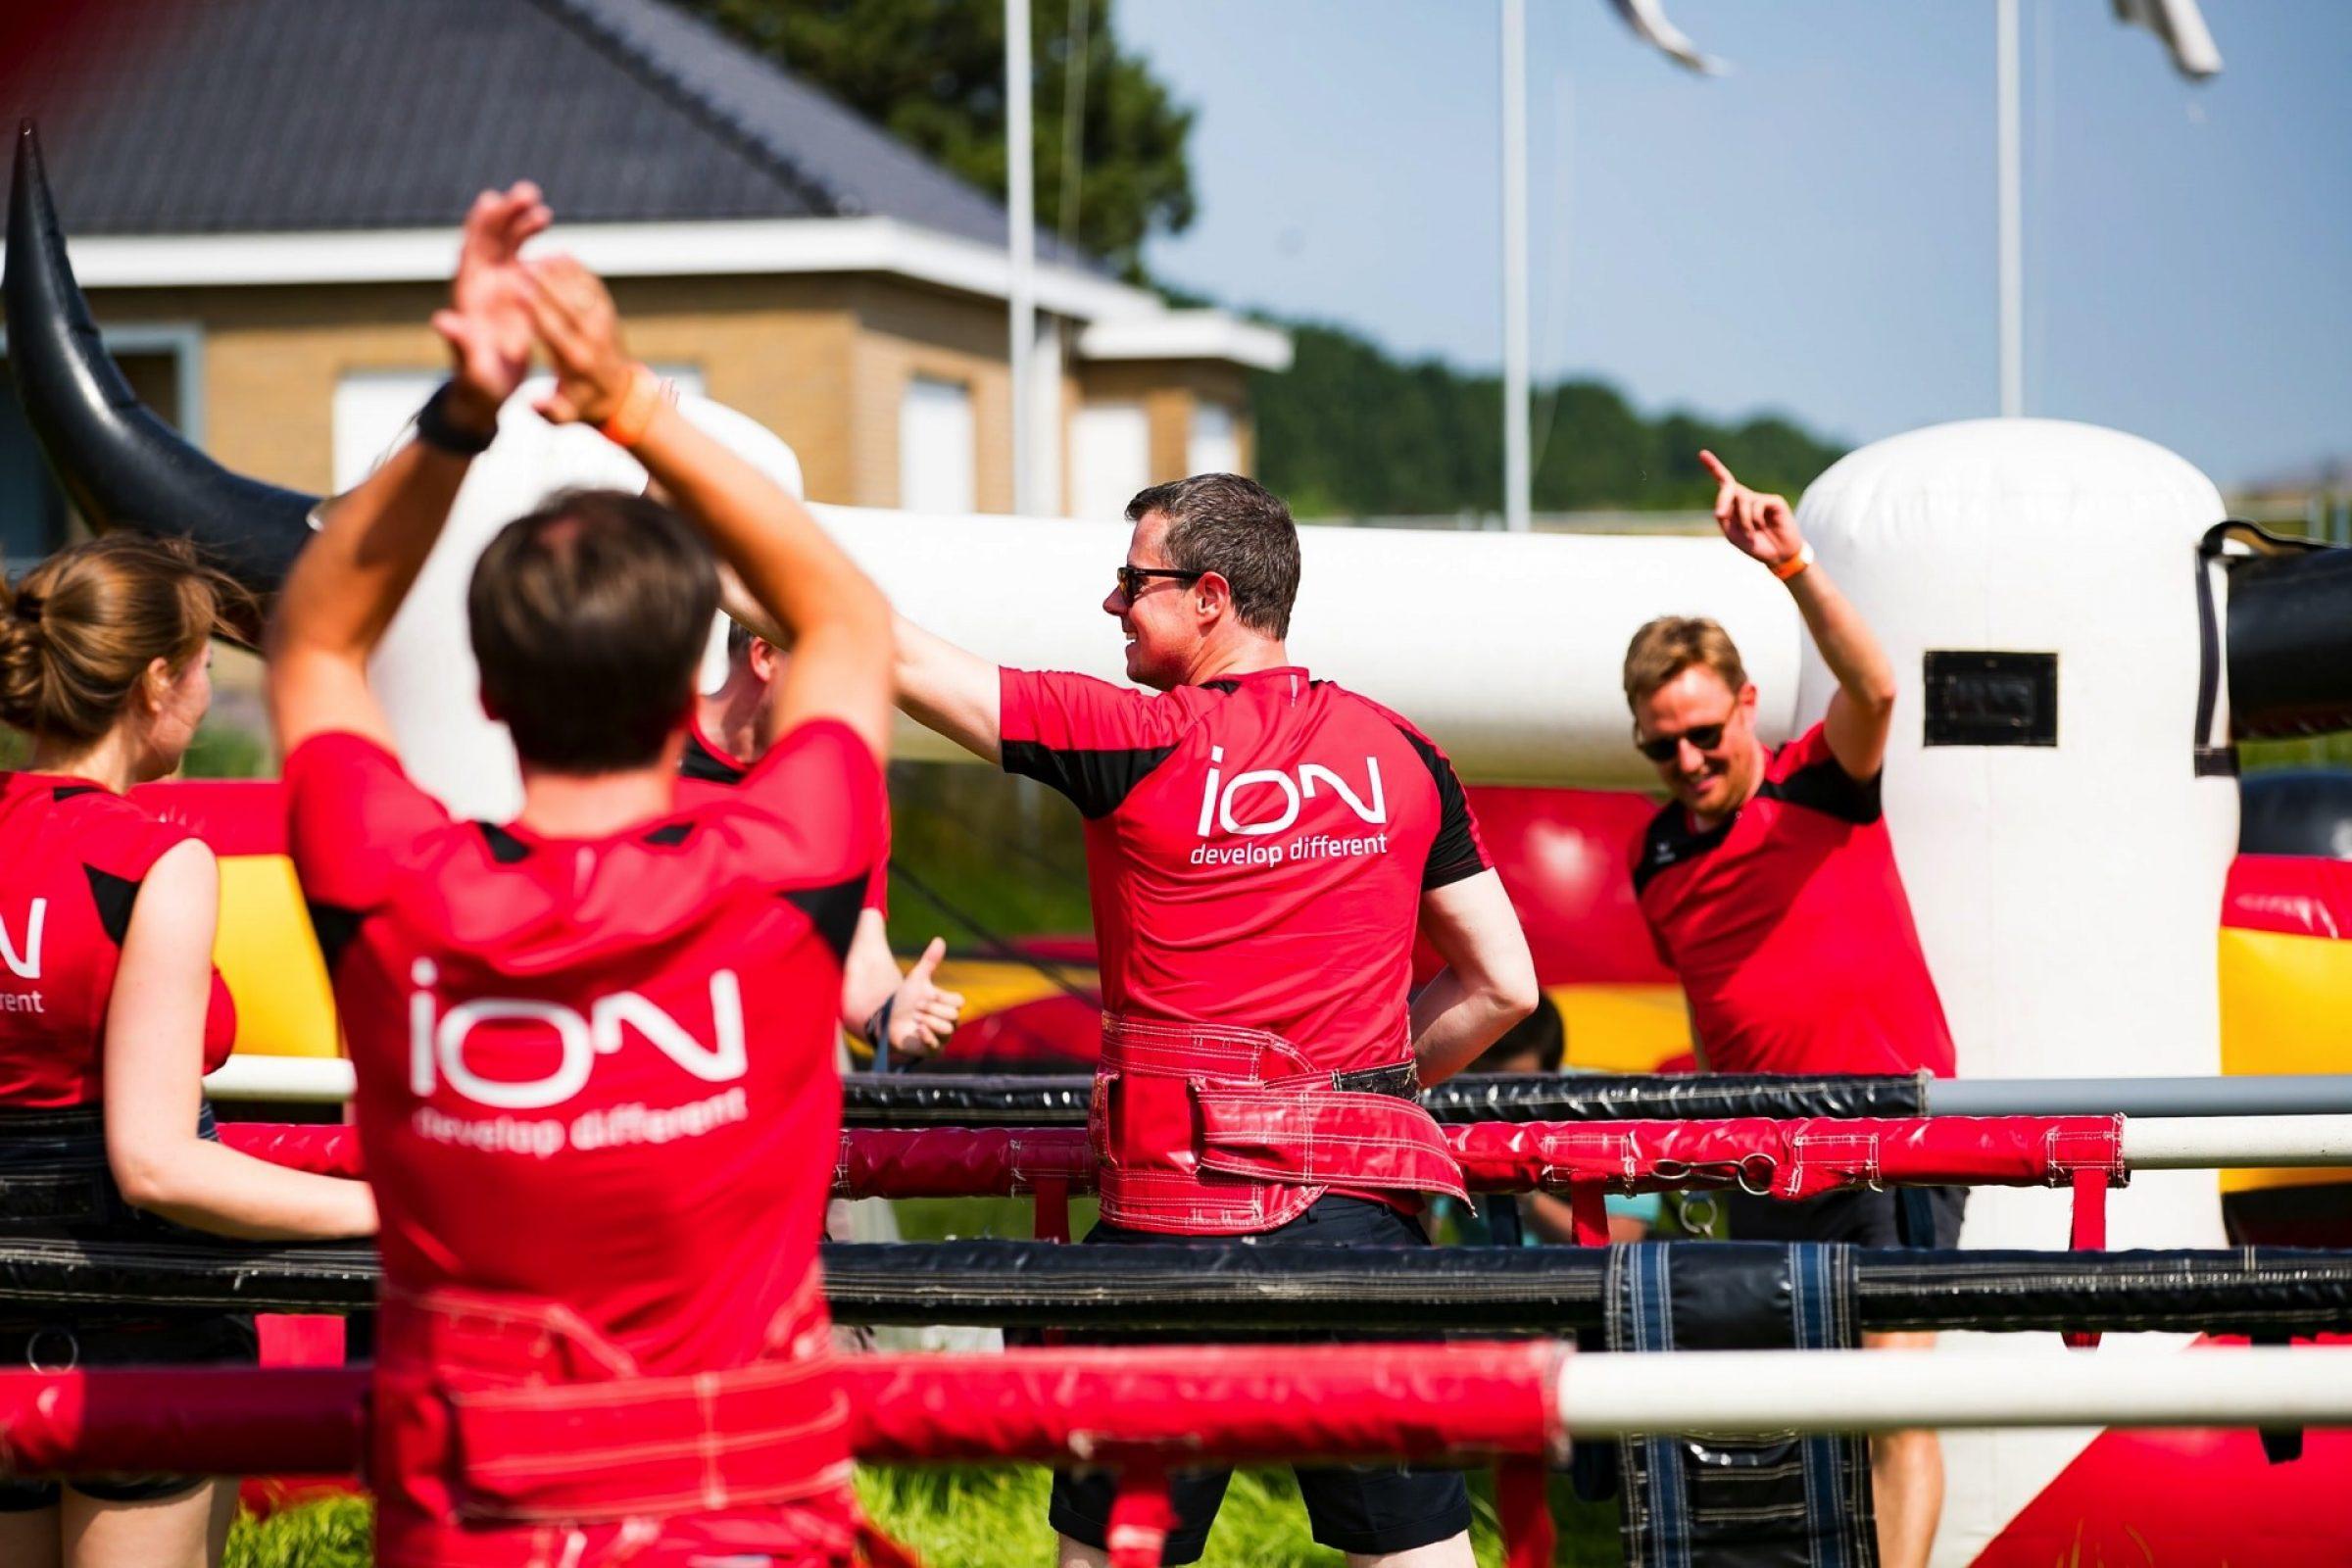 Fast Forward Eventbureau Gent Ion Tweedaagse Teambuilding Oostendeion 3